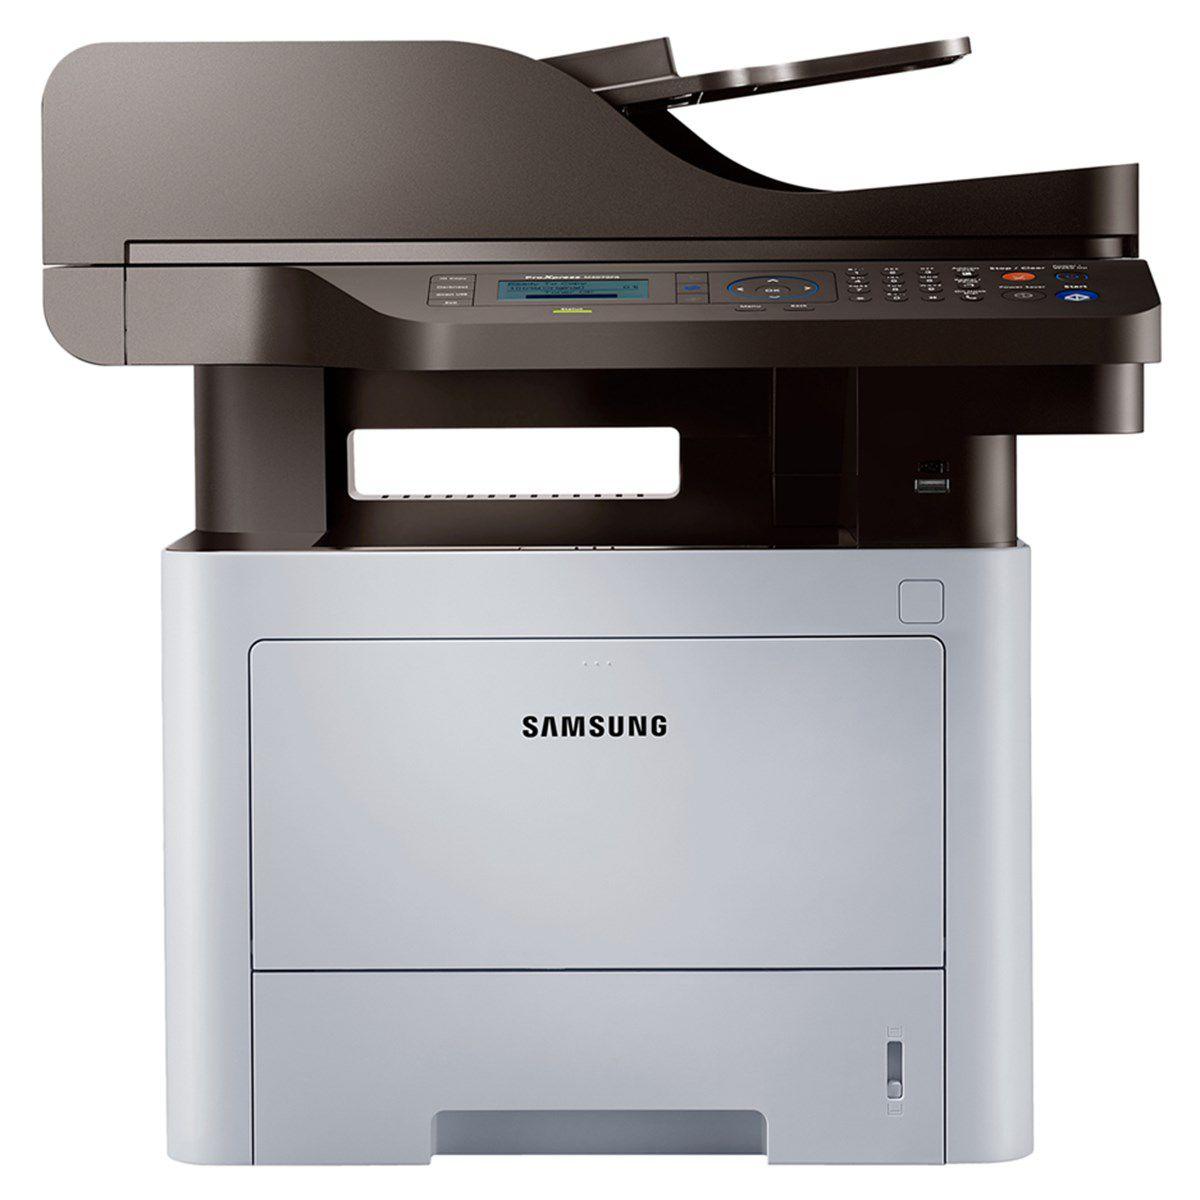 SAMSUNG 4070 SL